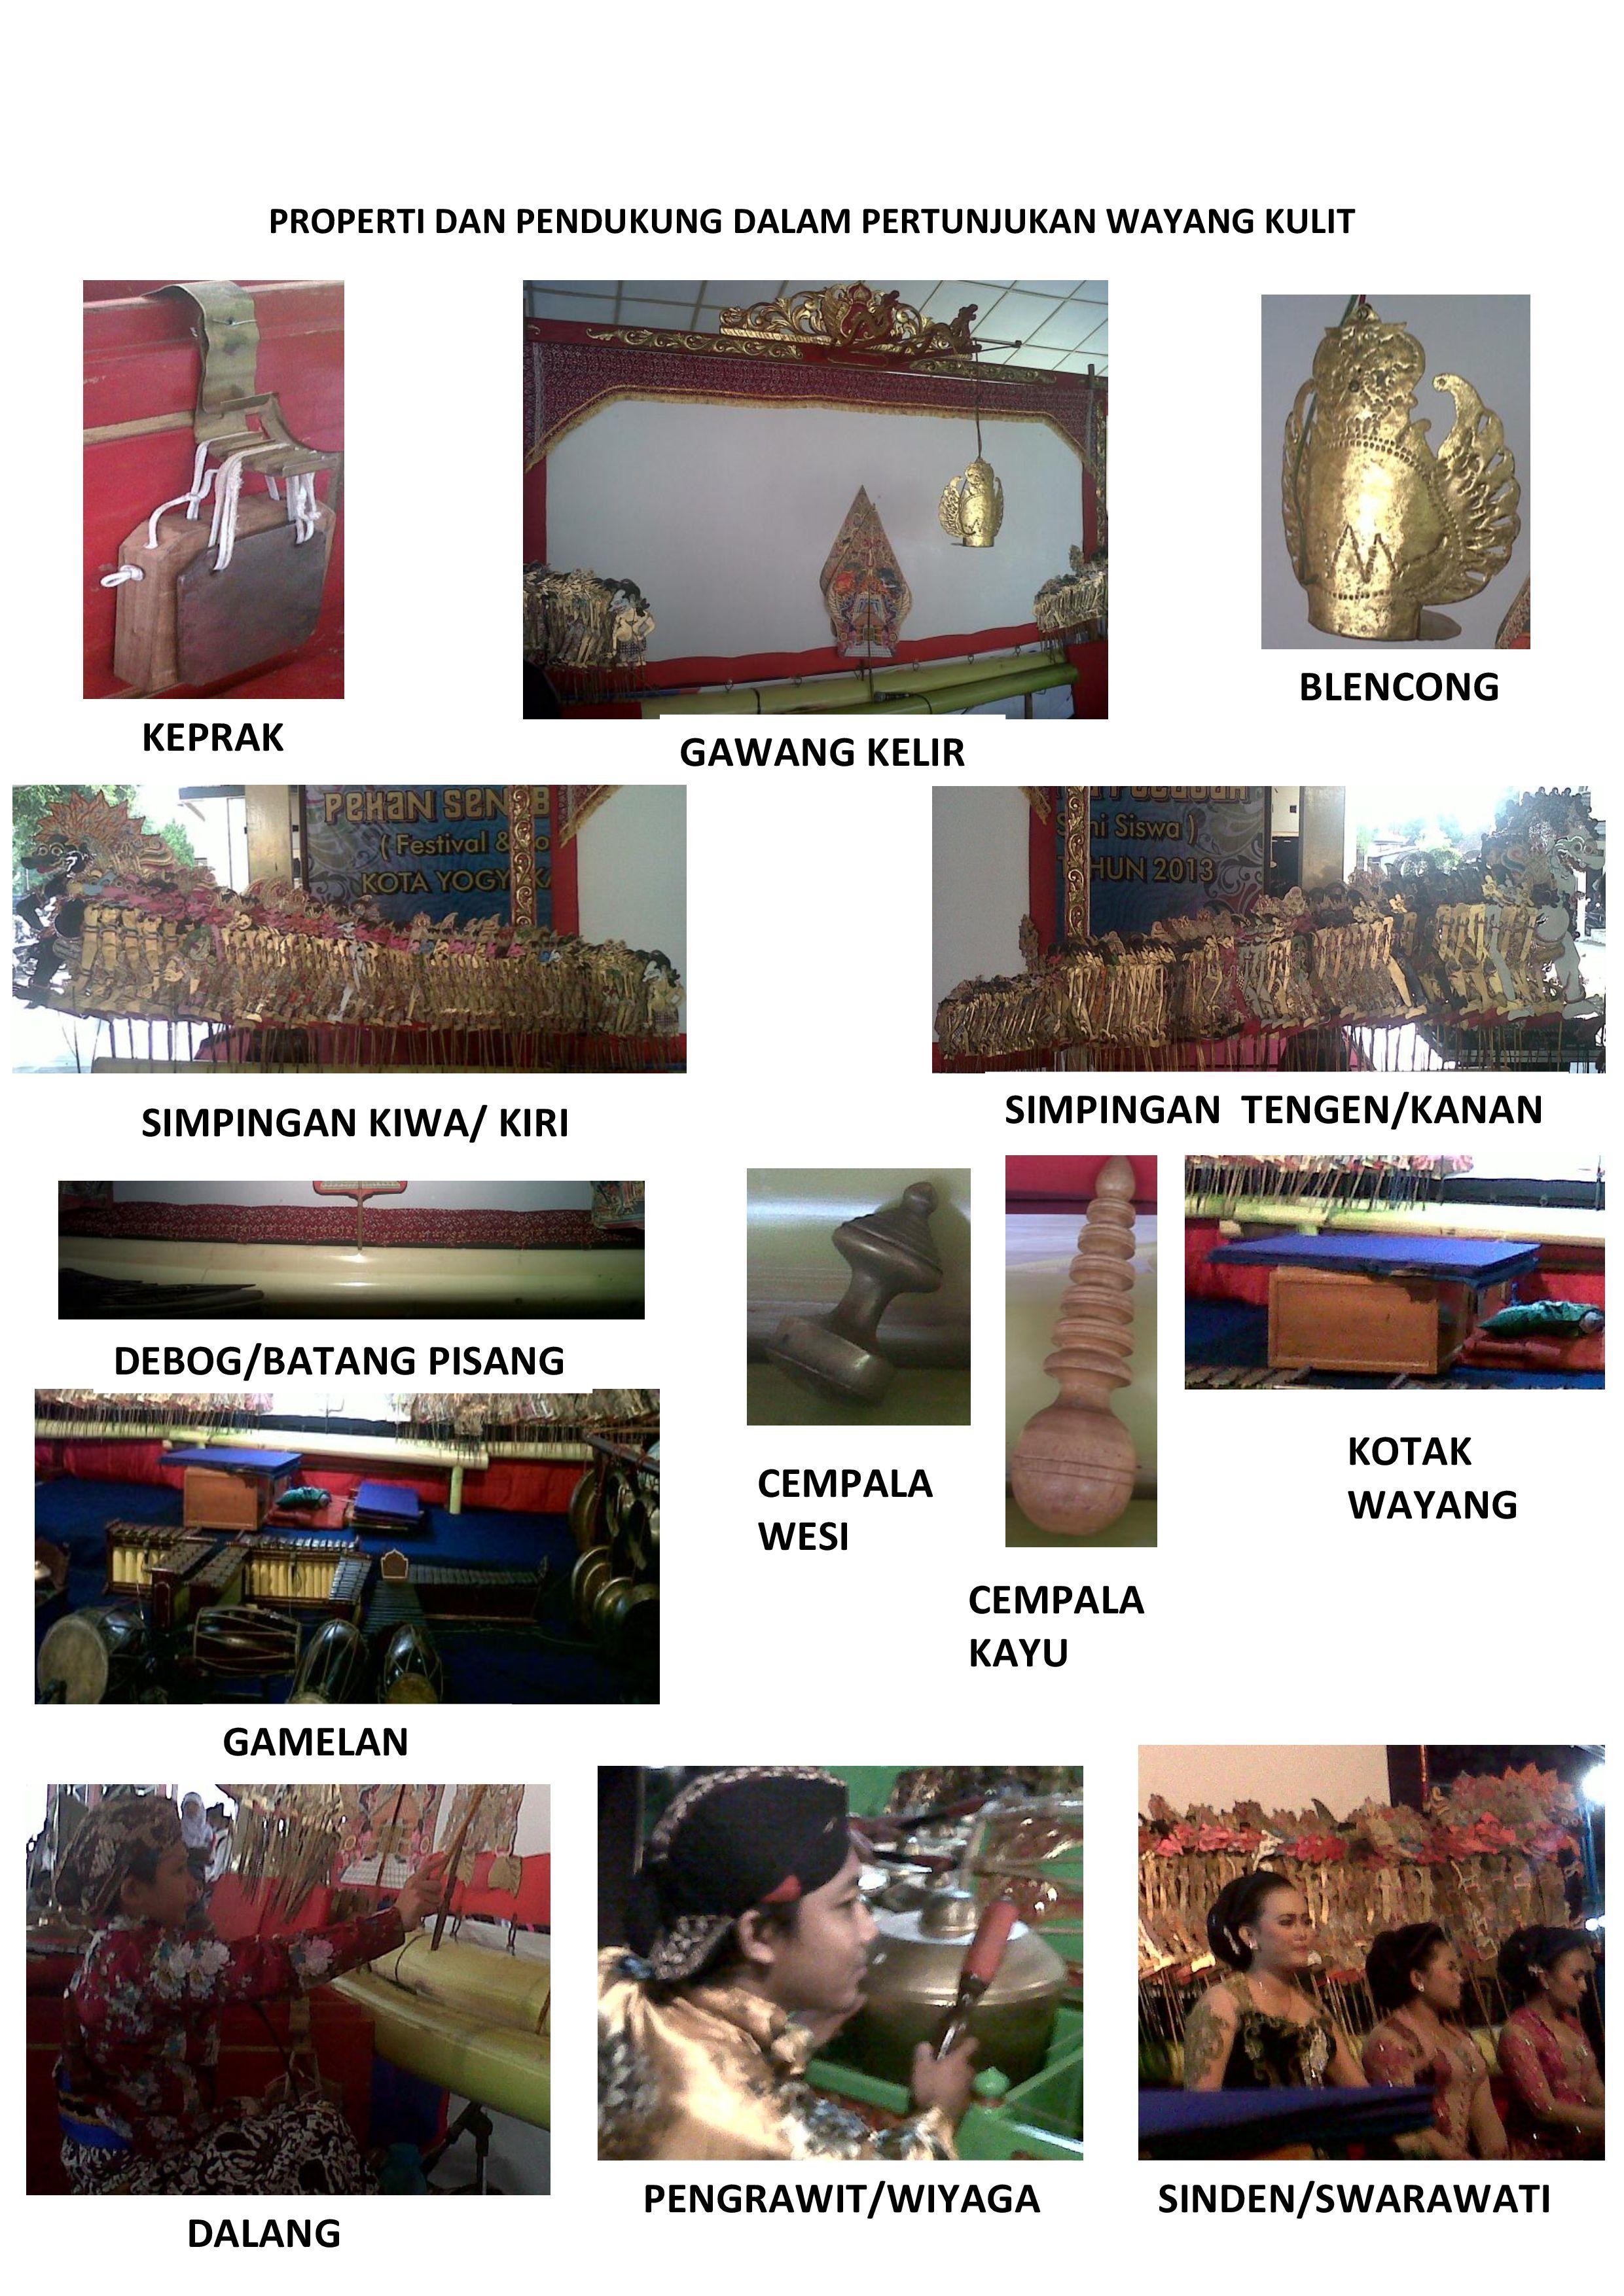 42 jenenge wayang wadon nama wayang wanita kejawen wetan. Unsur Unsur Dalam Pertunjukan Wayang Kulit Purwa Classical Javanese Gamelan Shadow Puppet And Dance